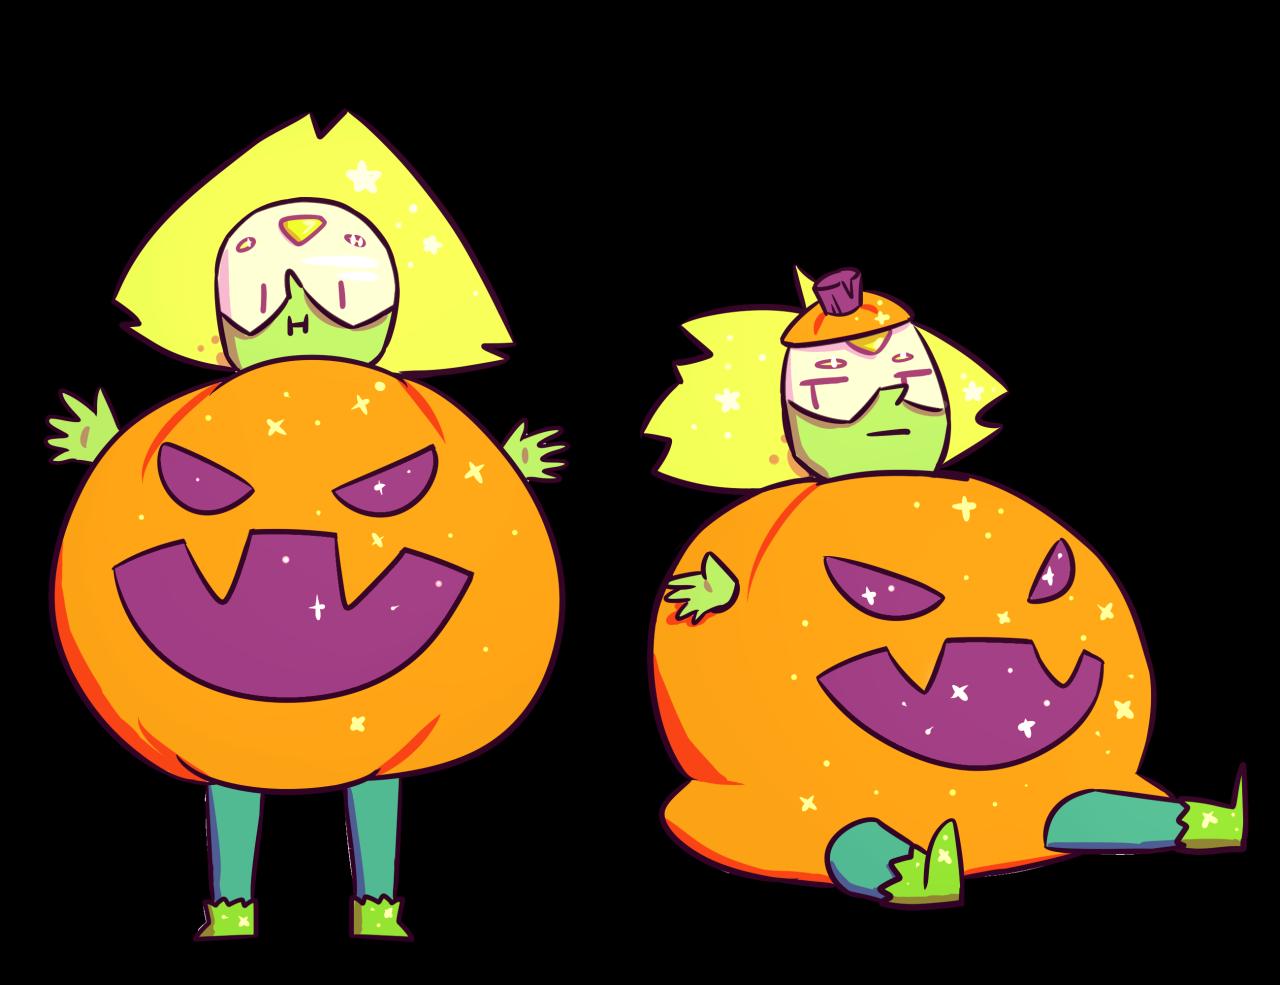 Rotten pumpkin clipart transparent stock Peridot in a Pumpkin Costume | Steven Universe | Know Your Meme transparent stock